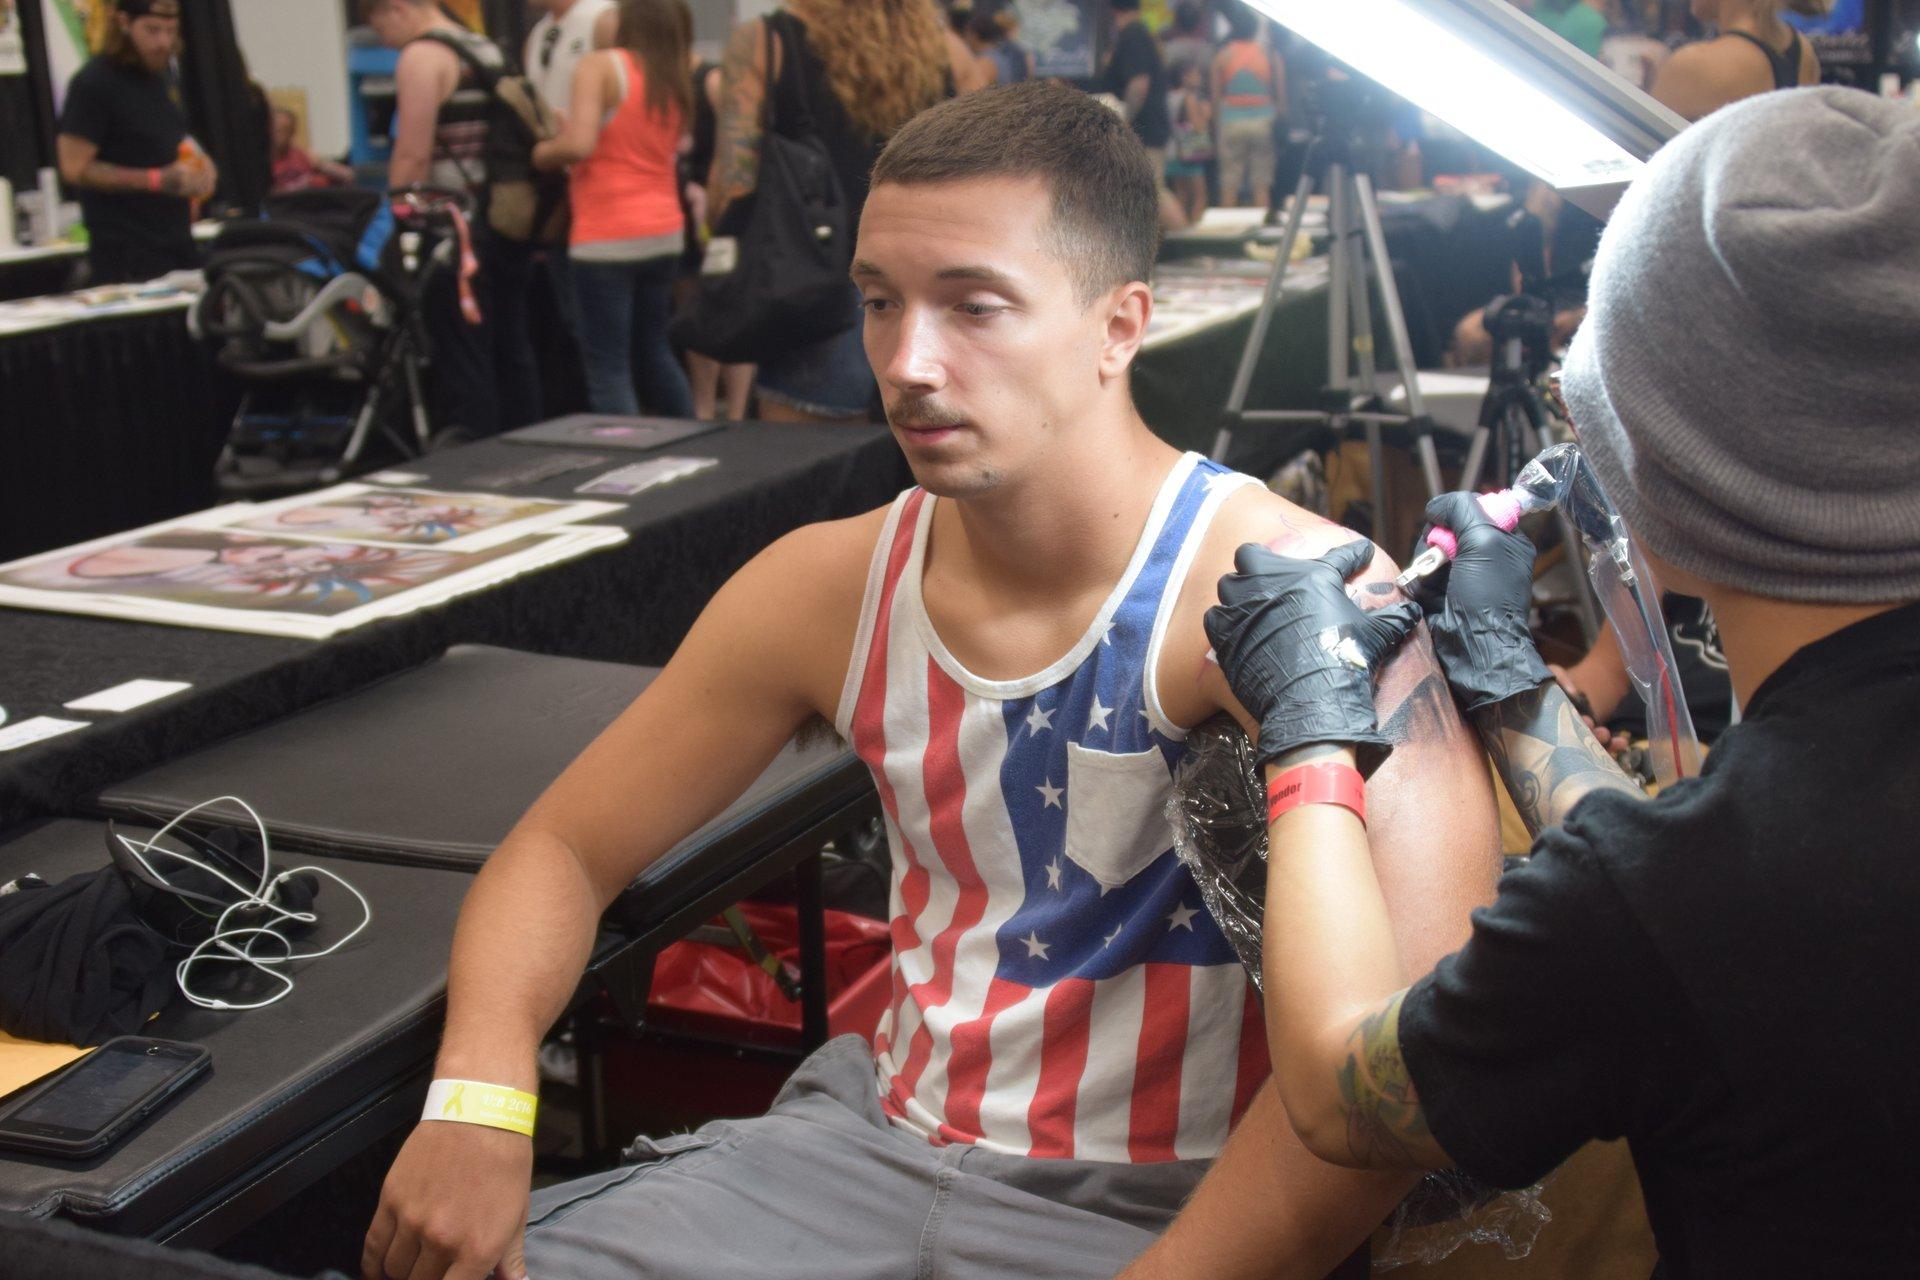 Virginia Beach Tattoo Festival in Virginia - Best Season 2020